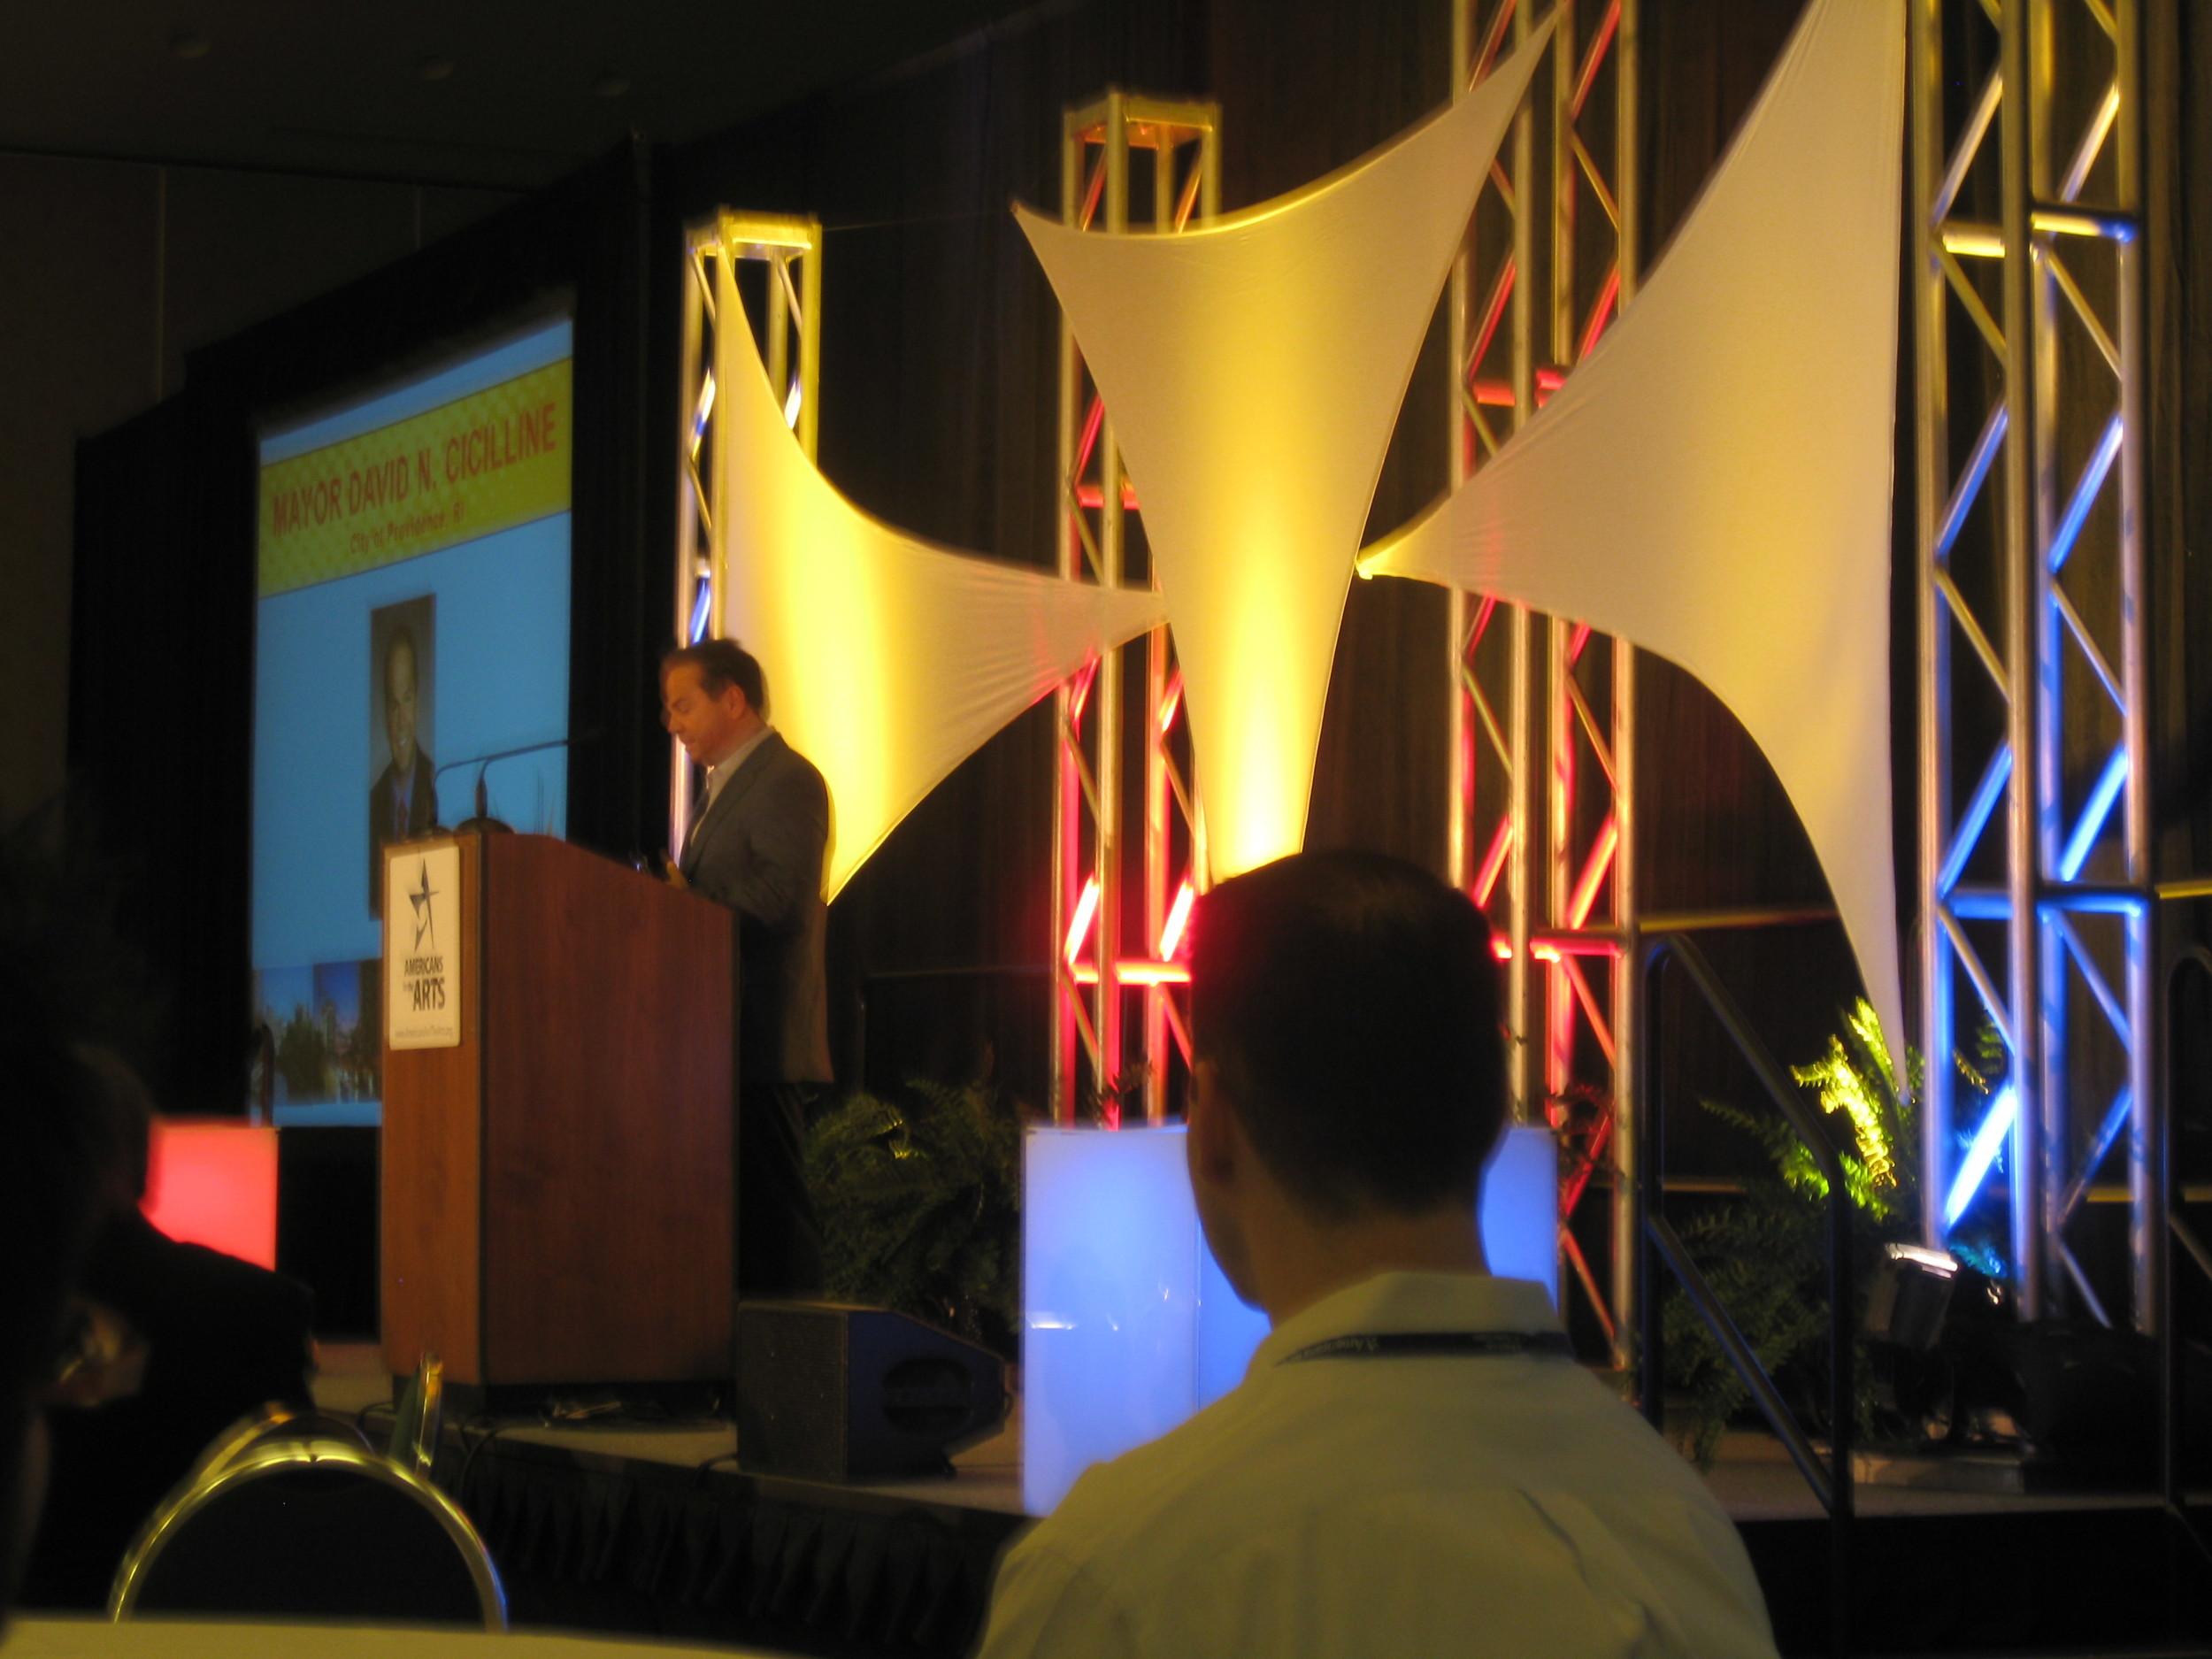 NAMP Conference - Keynote